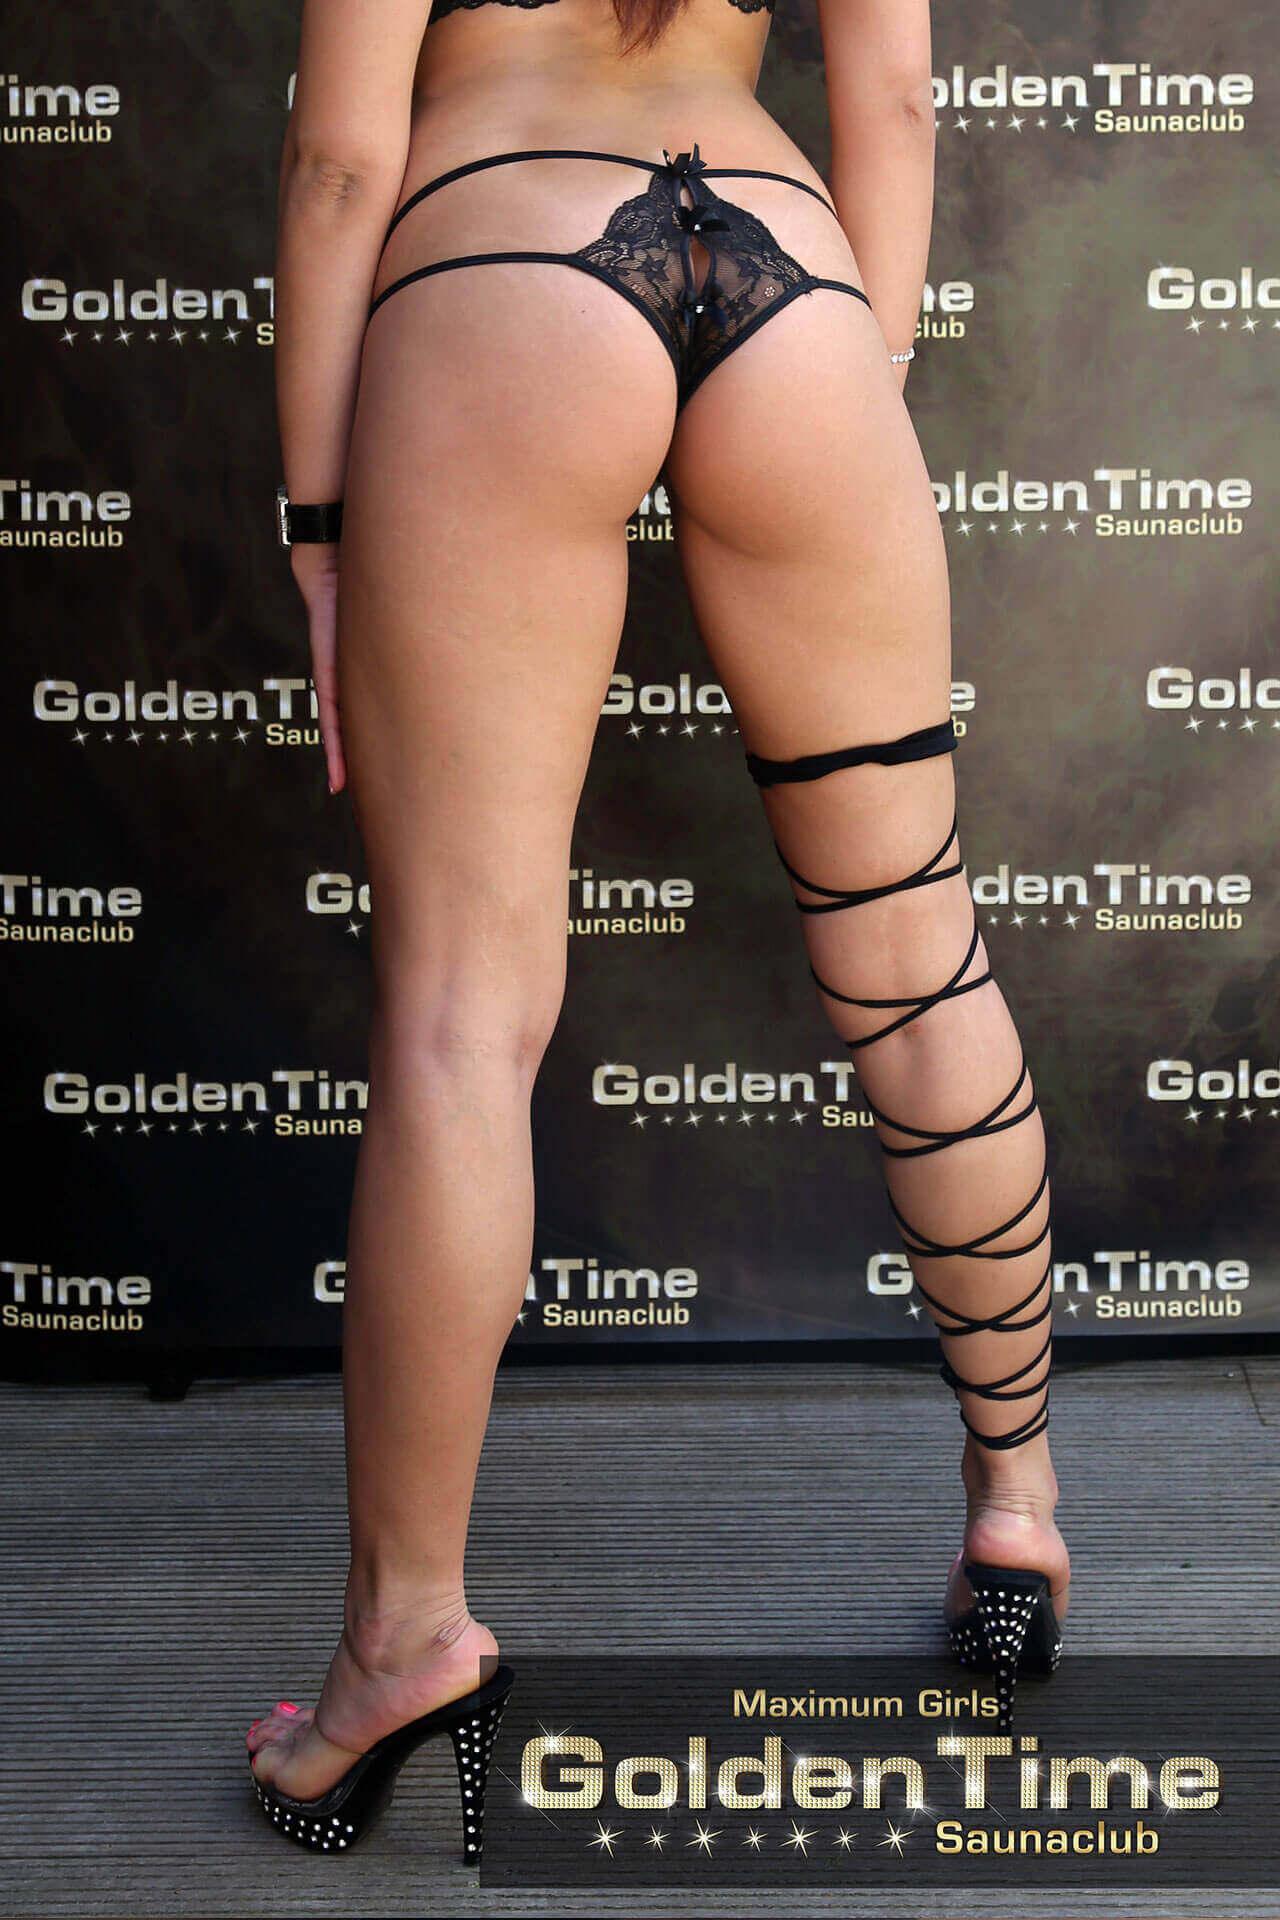 01-vatertag-pic-006-goldentime-saunaclub.jpg